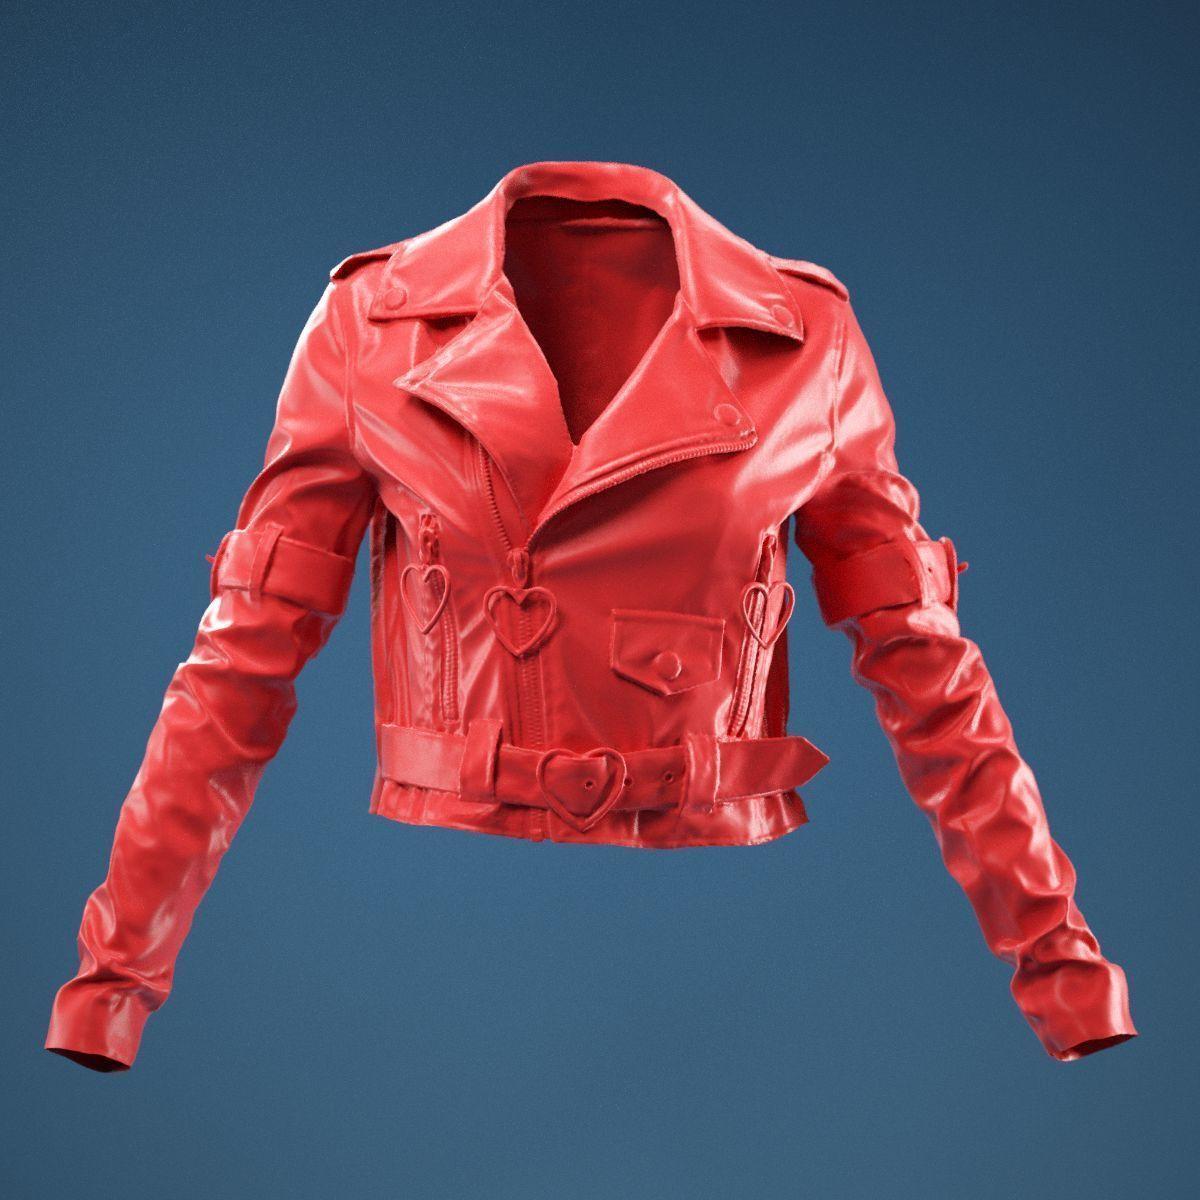 Pink PVC Jacket Closed